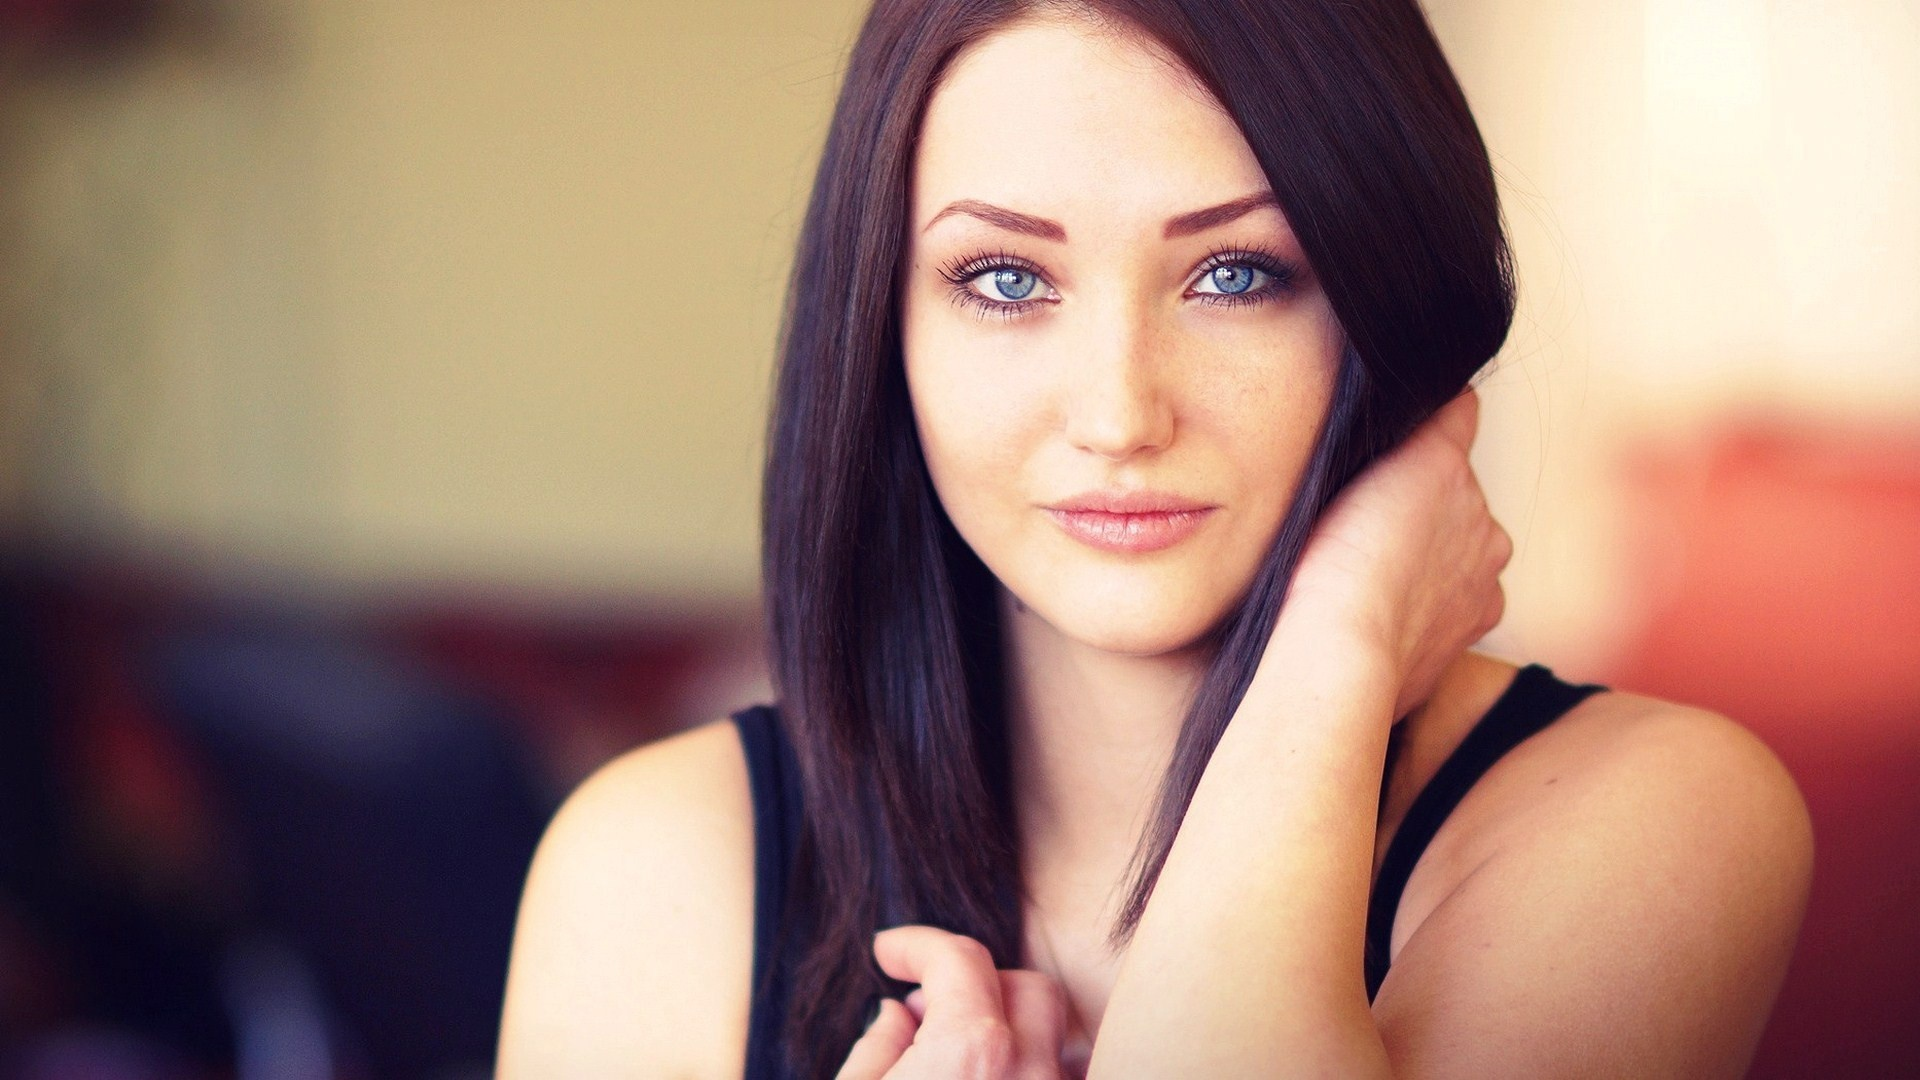 Black-hair-girl-blue-eyes_1920x1080